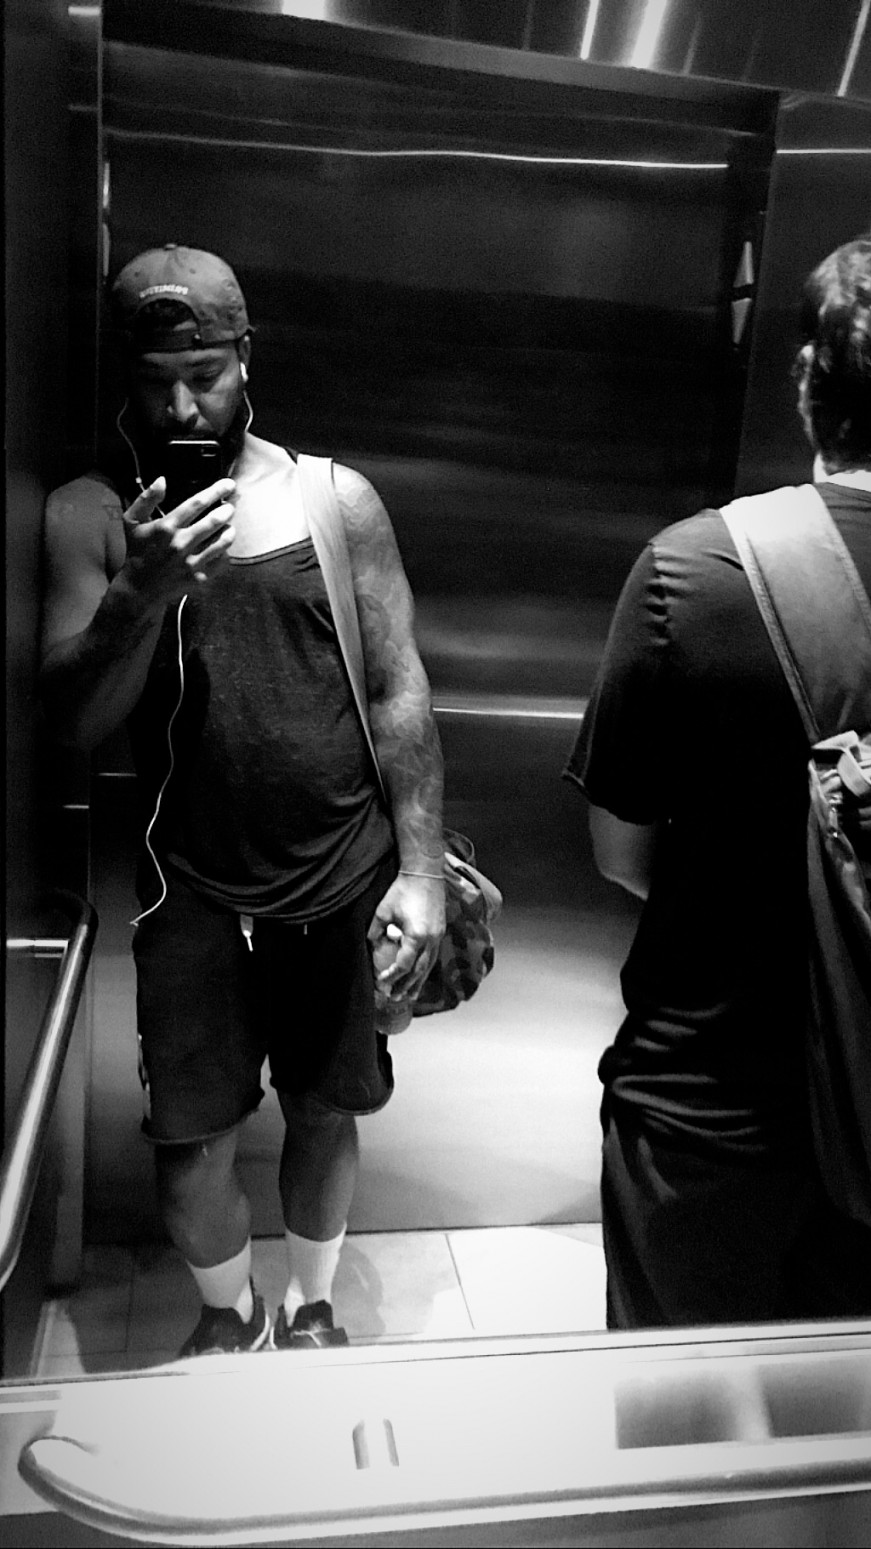 elevator black and white